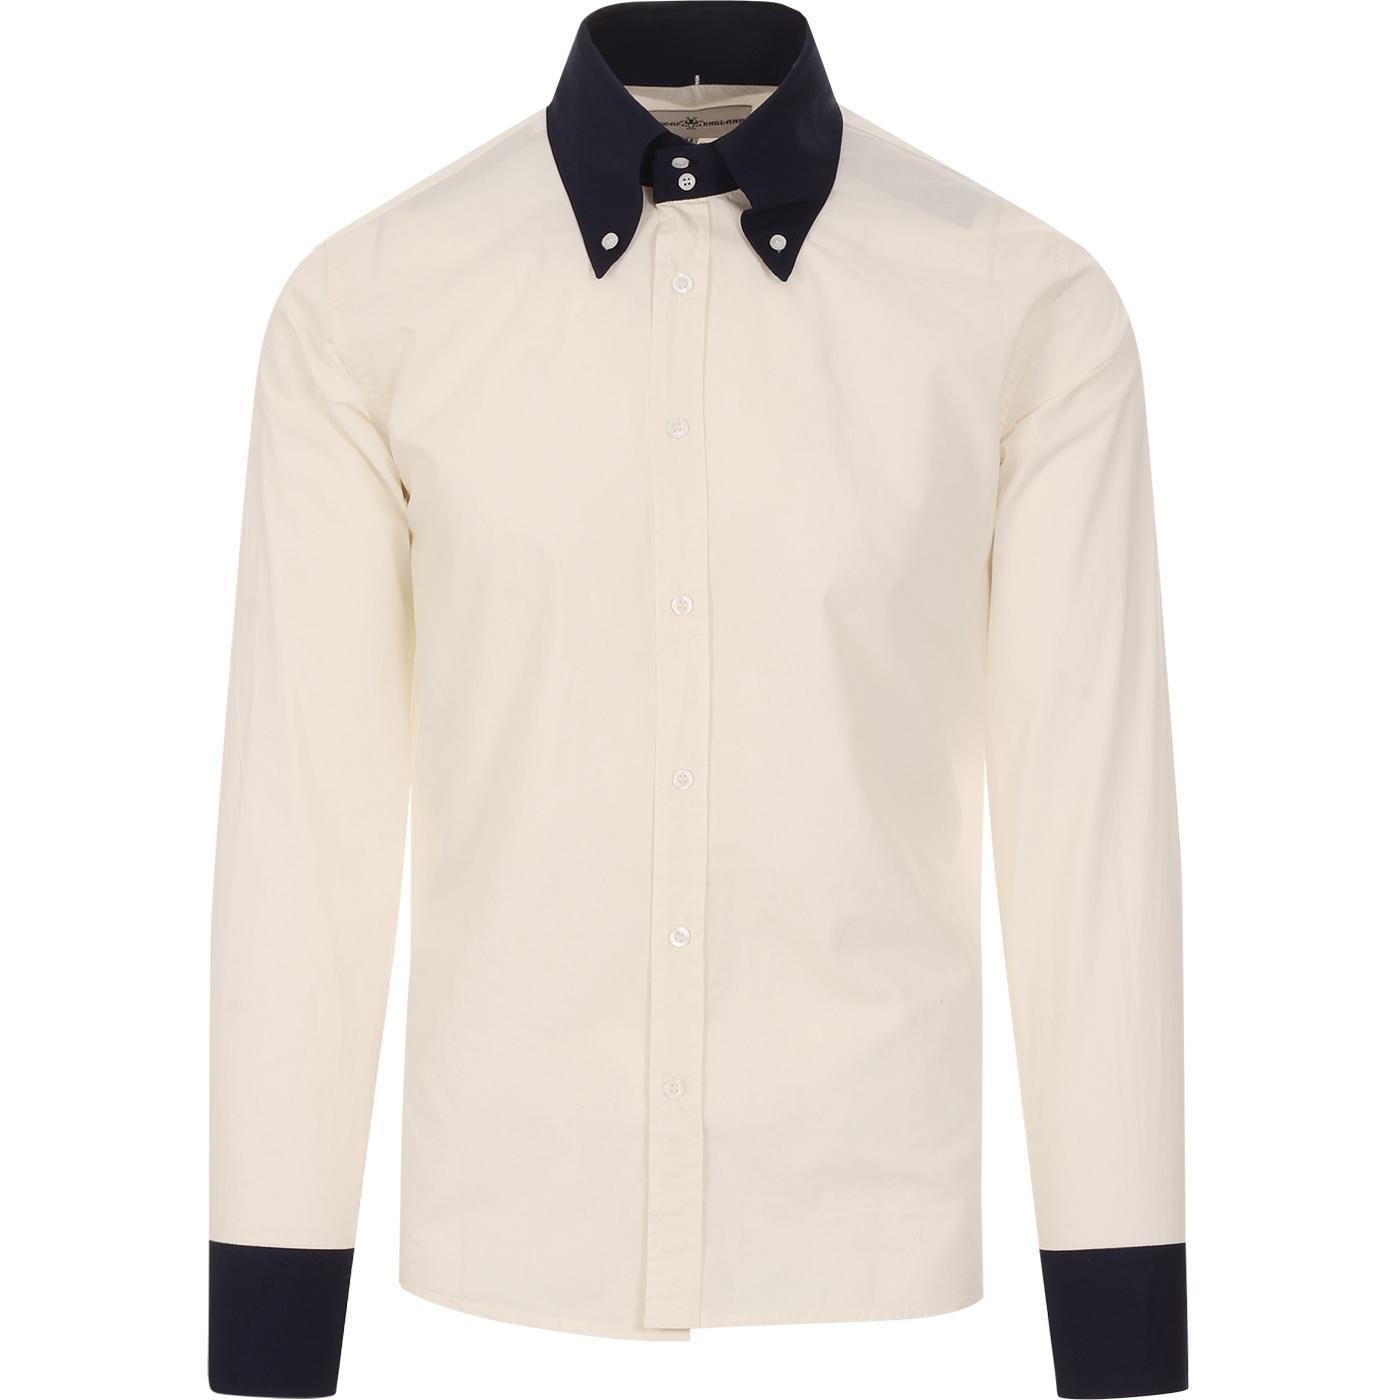 Casino MADCAP ENGLAND Mod Two Tone BD Shirt (OW/N)